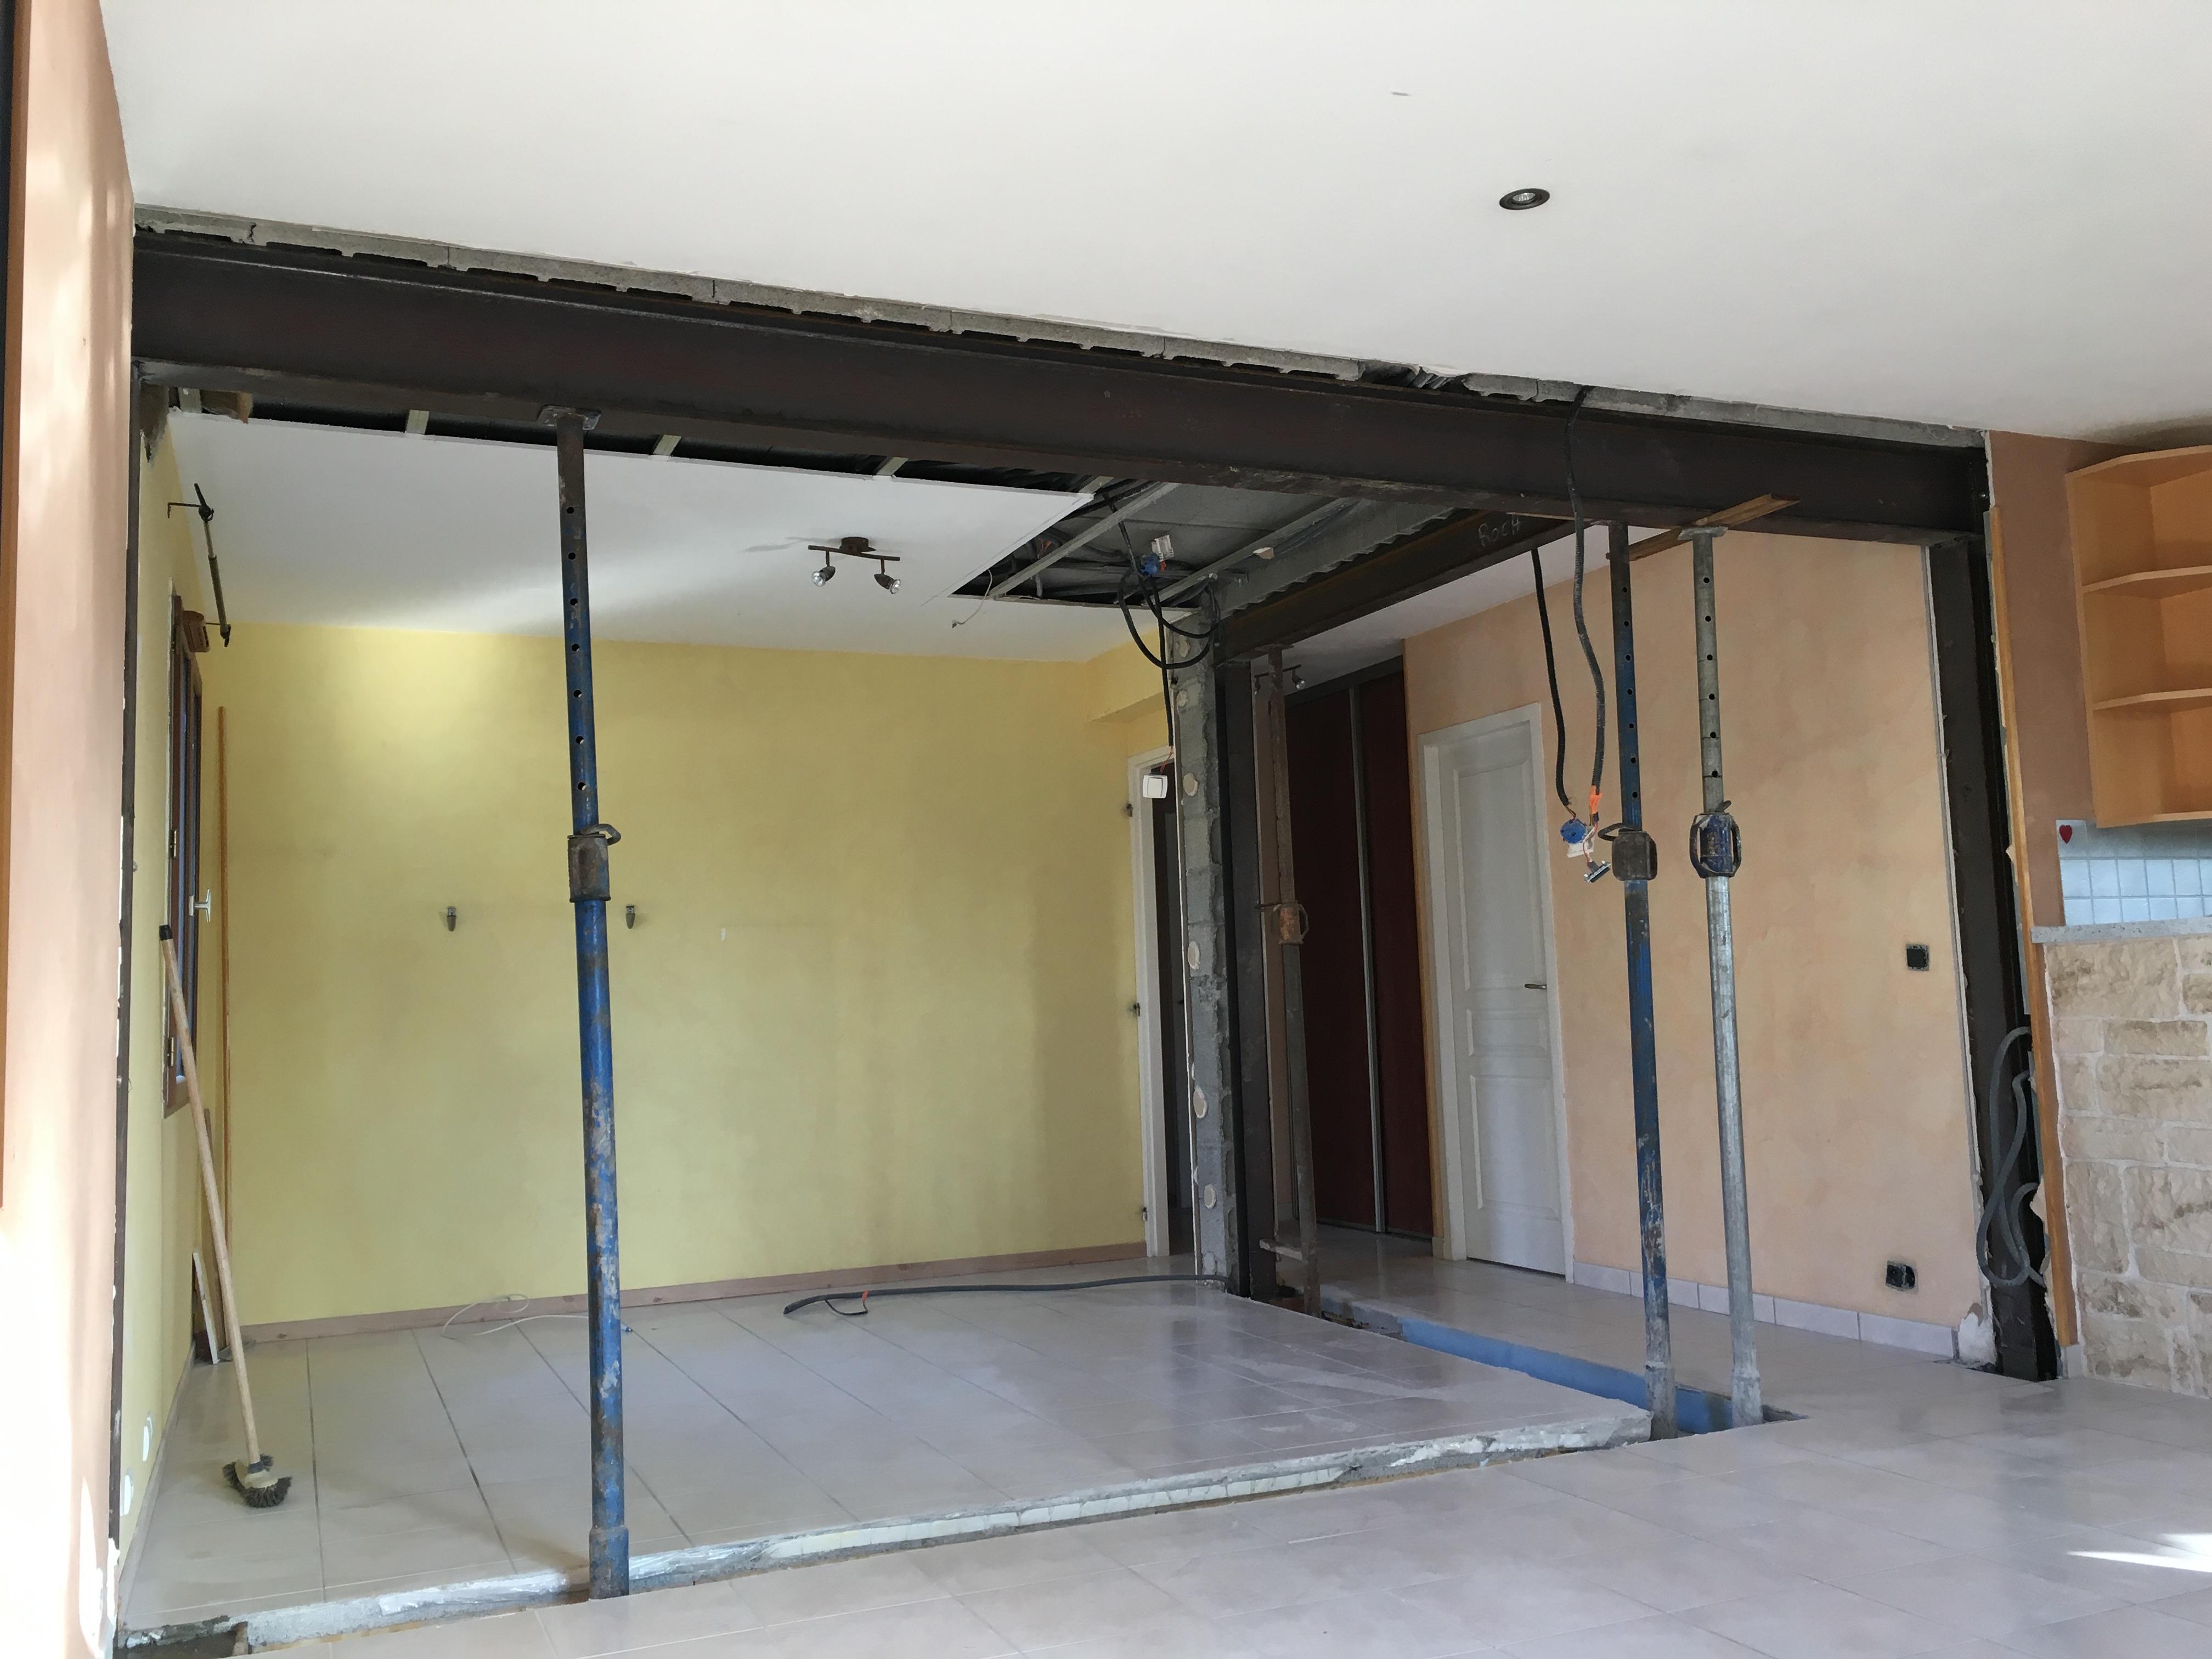 Casser un mur porteur cout finest casser un mur porteur cout with casser un mur porteur cout - Calcul ipn mur porteur ...